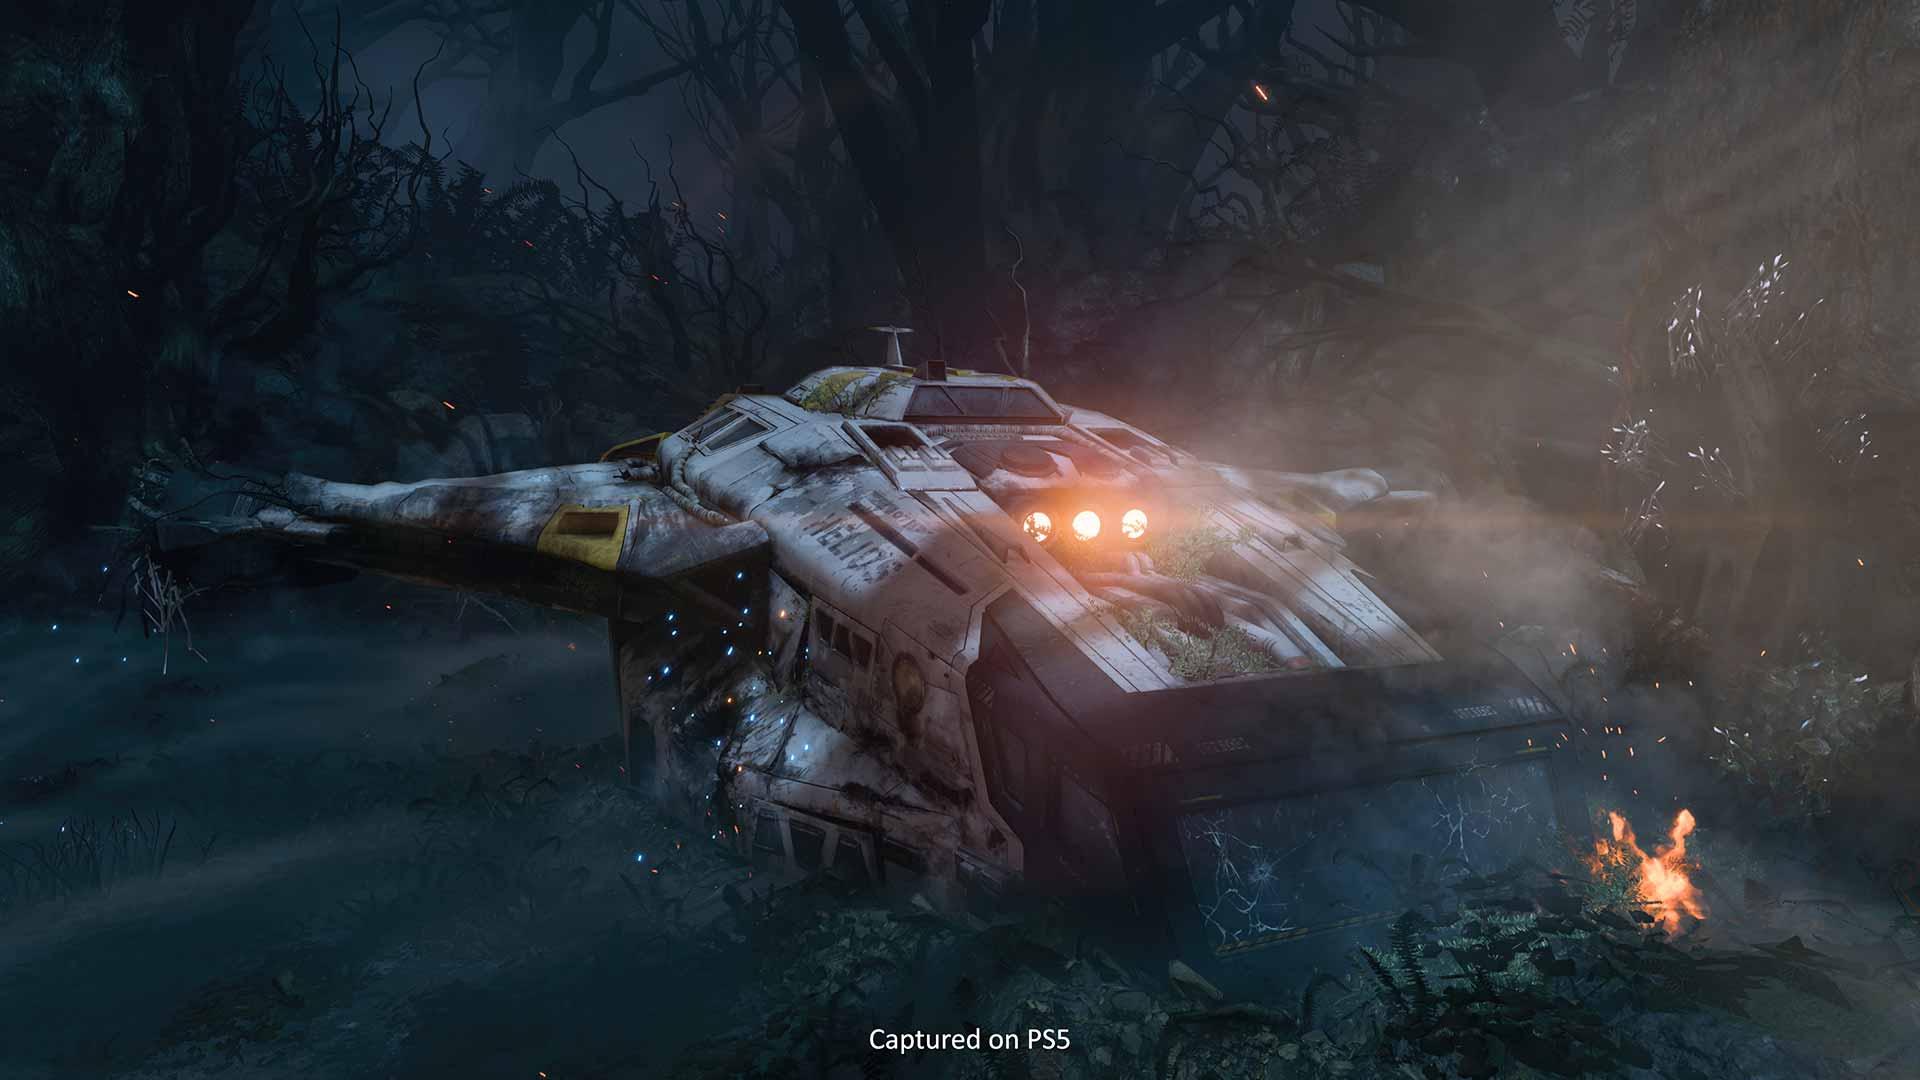 PS5 Returnal crashed ship